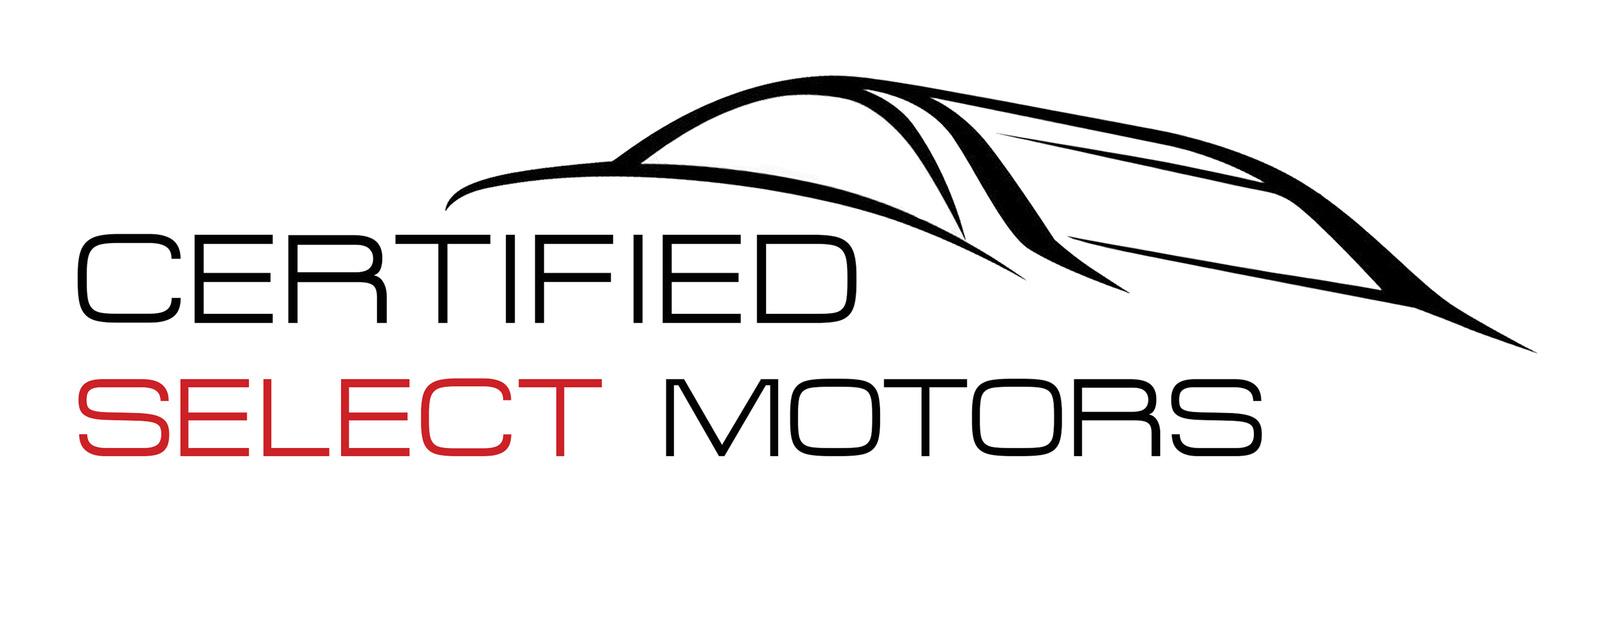 Select Motors Plymouth Michigan Impremedia Net